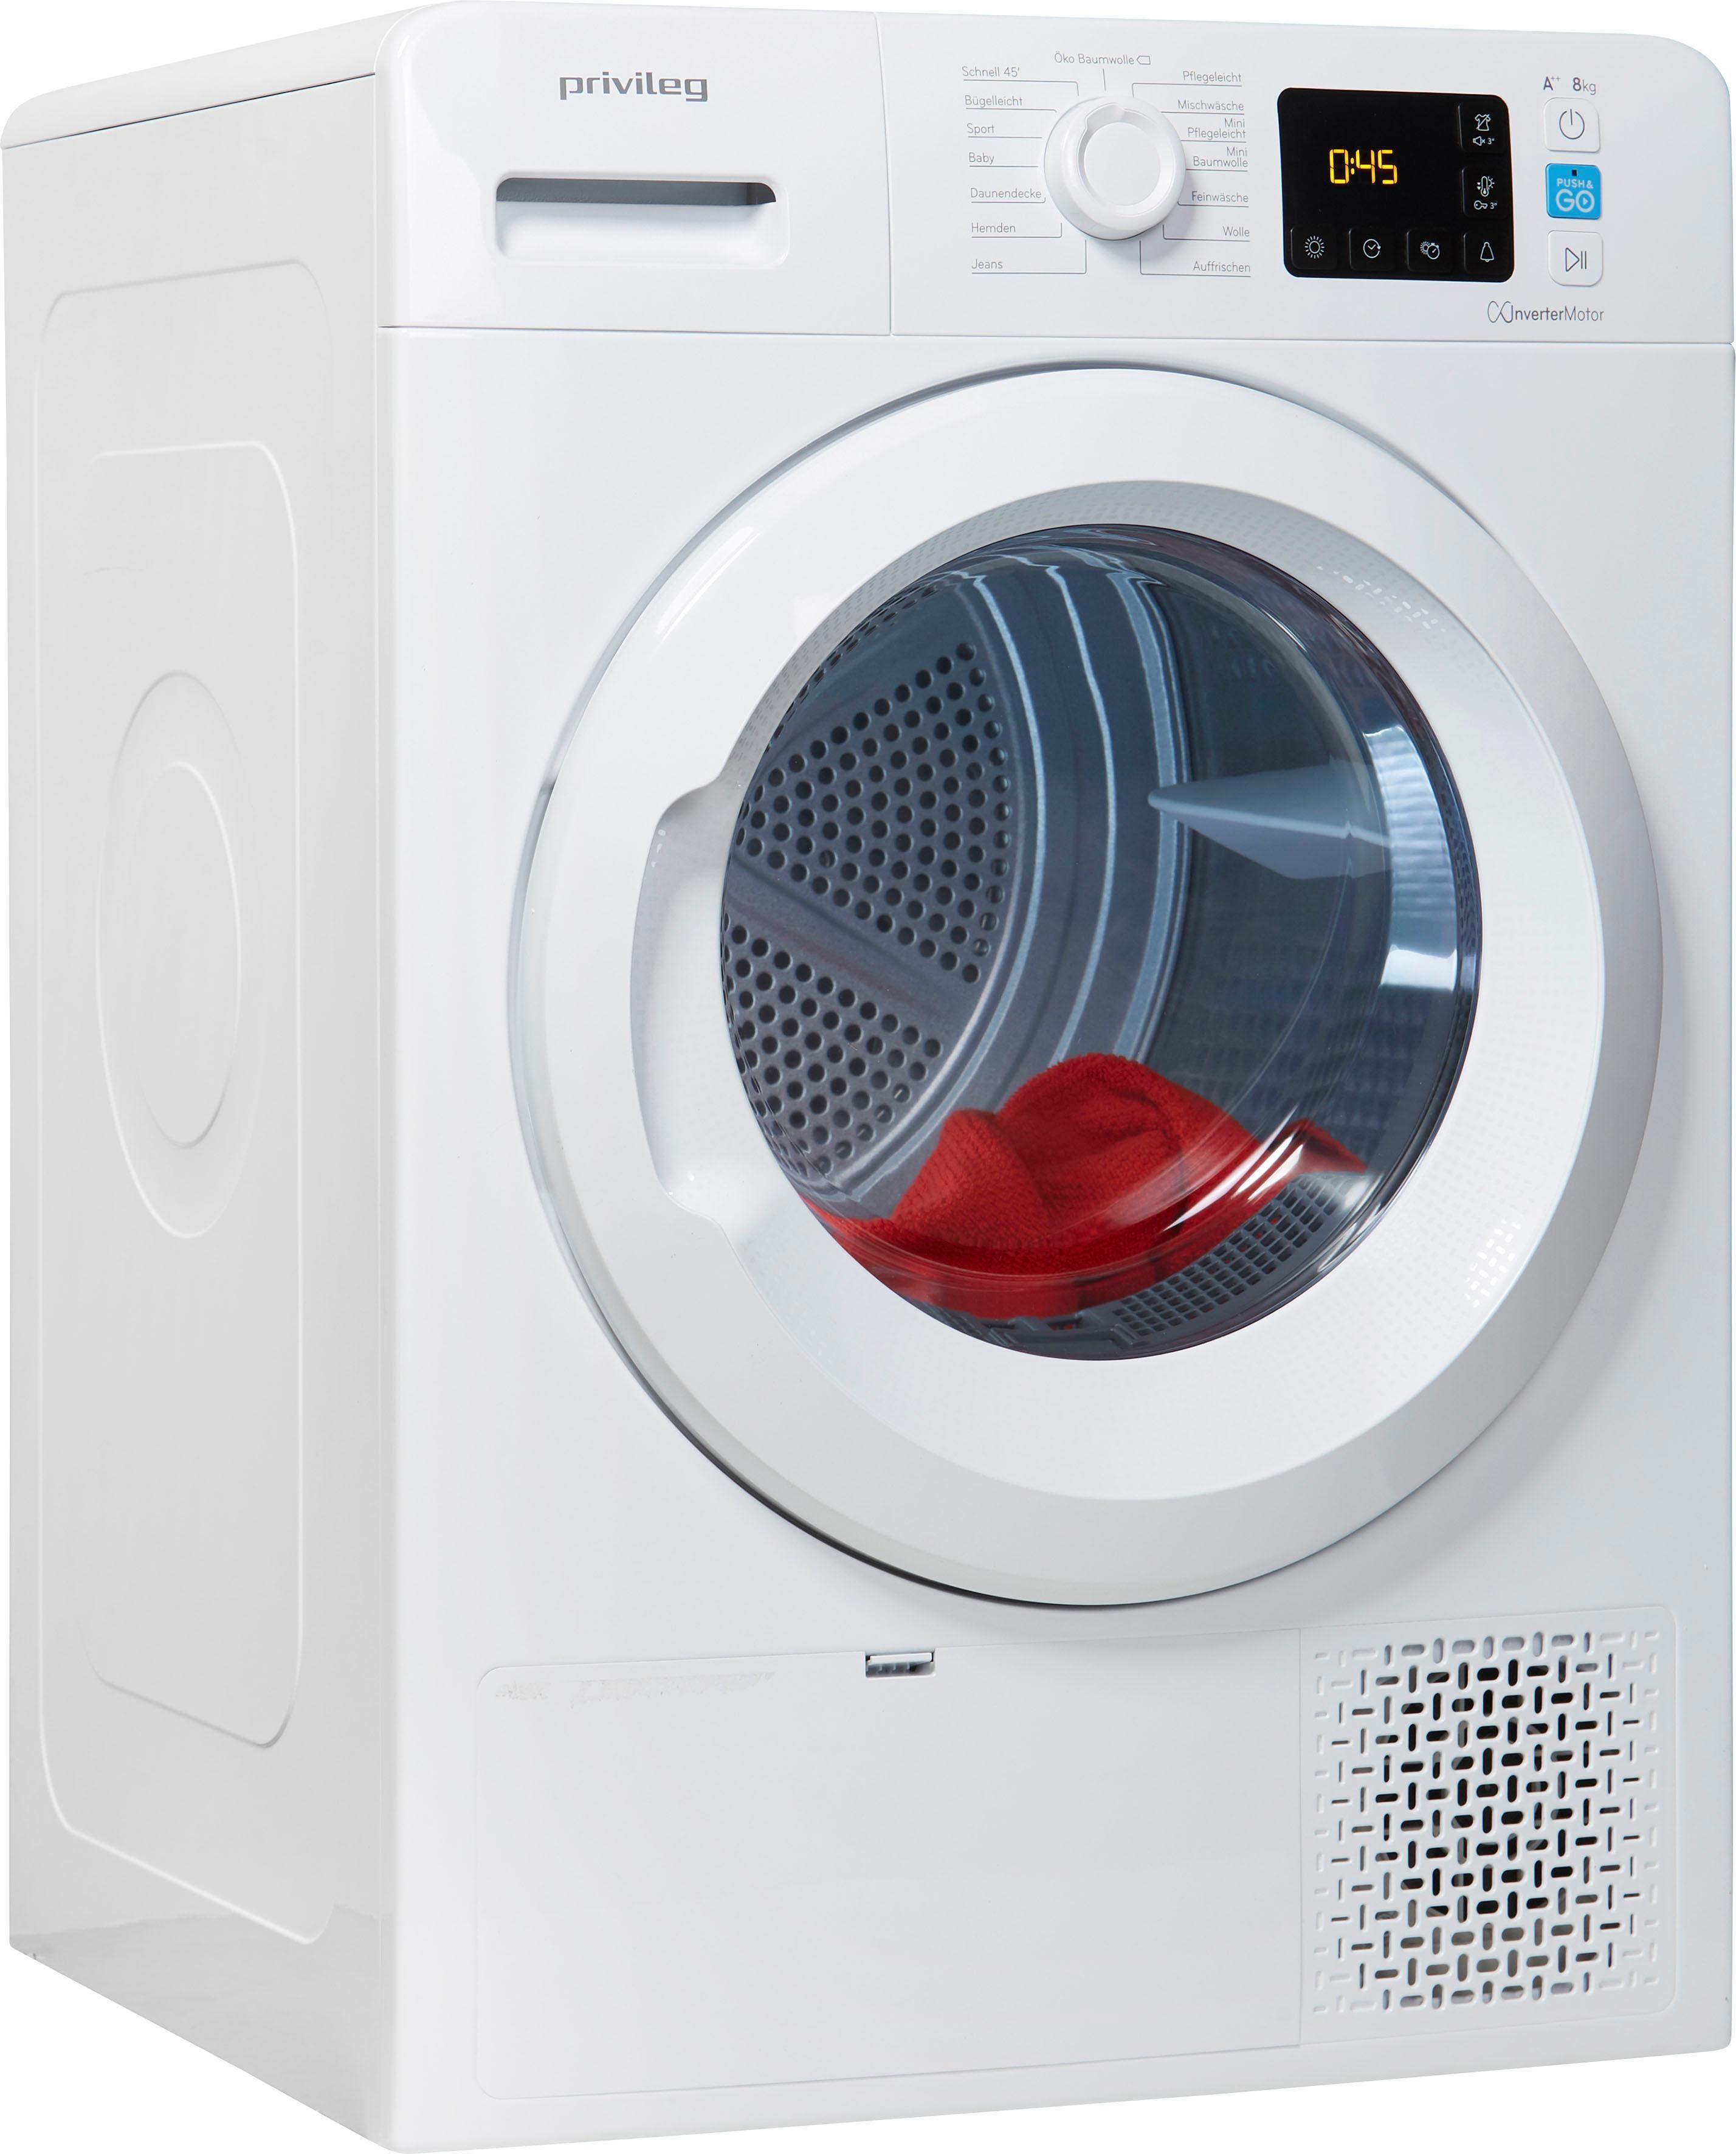 Privileg Wärmepumpentrockner PWCT M11 82 X DE, 8 kg | Bad > Waschmaschinen und Trockner > Wärmepumpentrockner | PRIVILEG